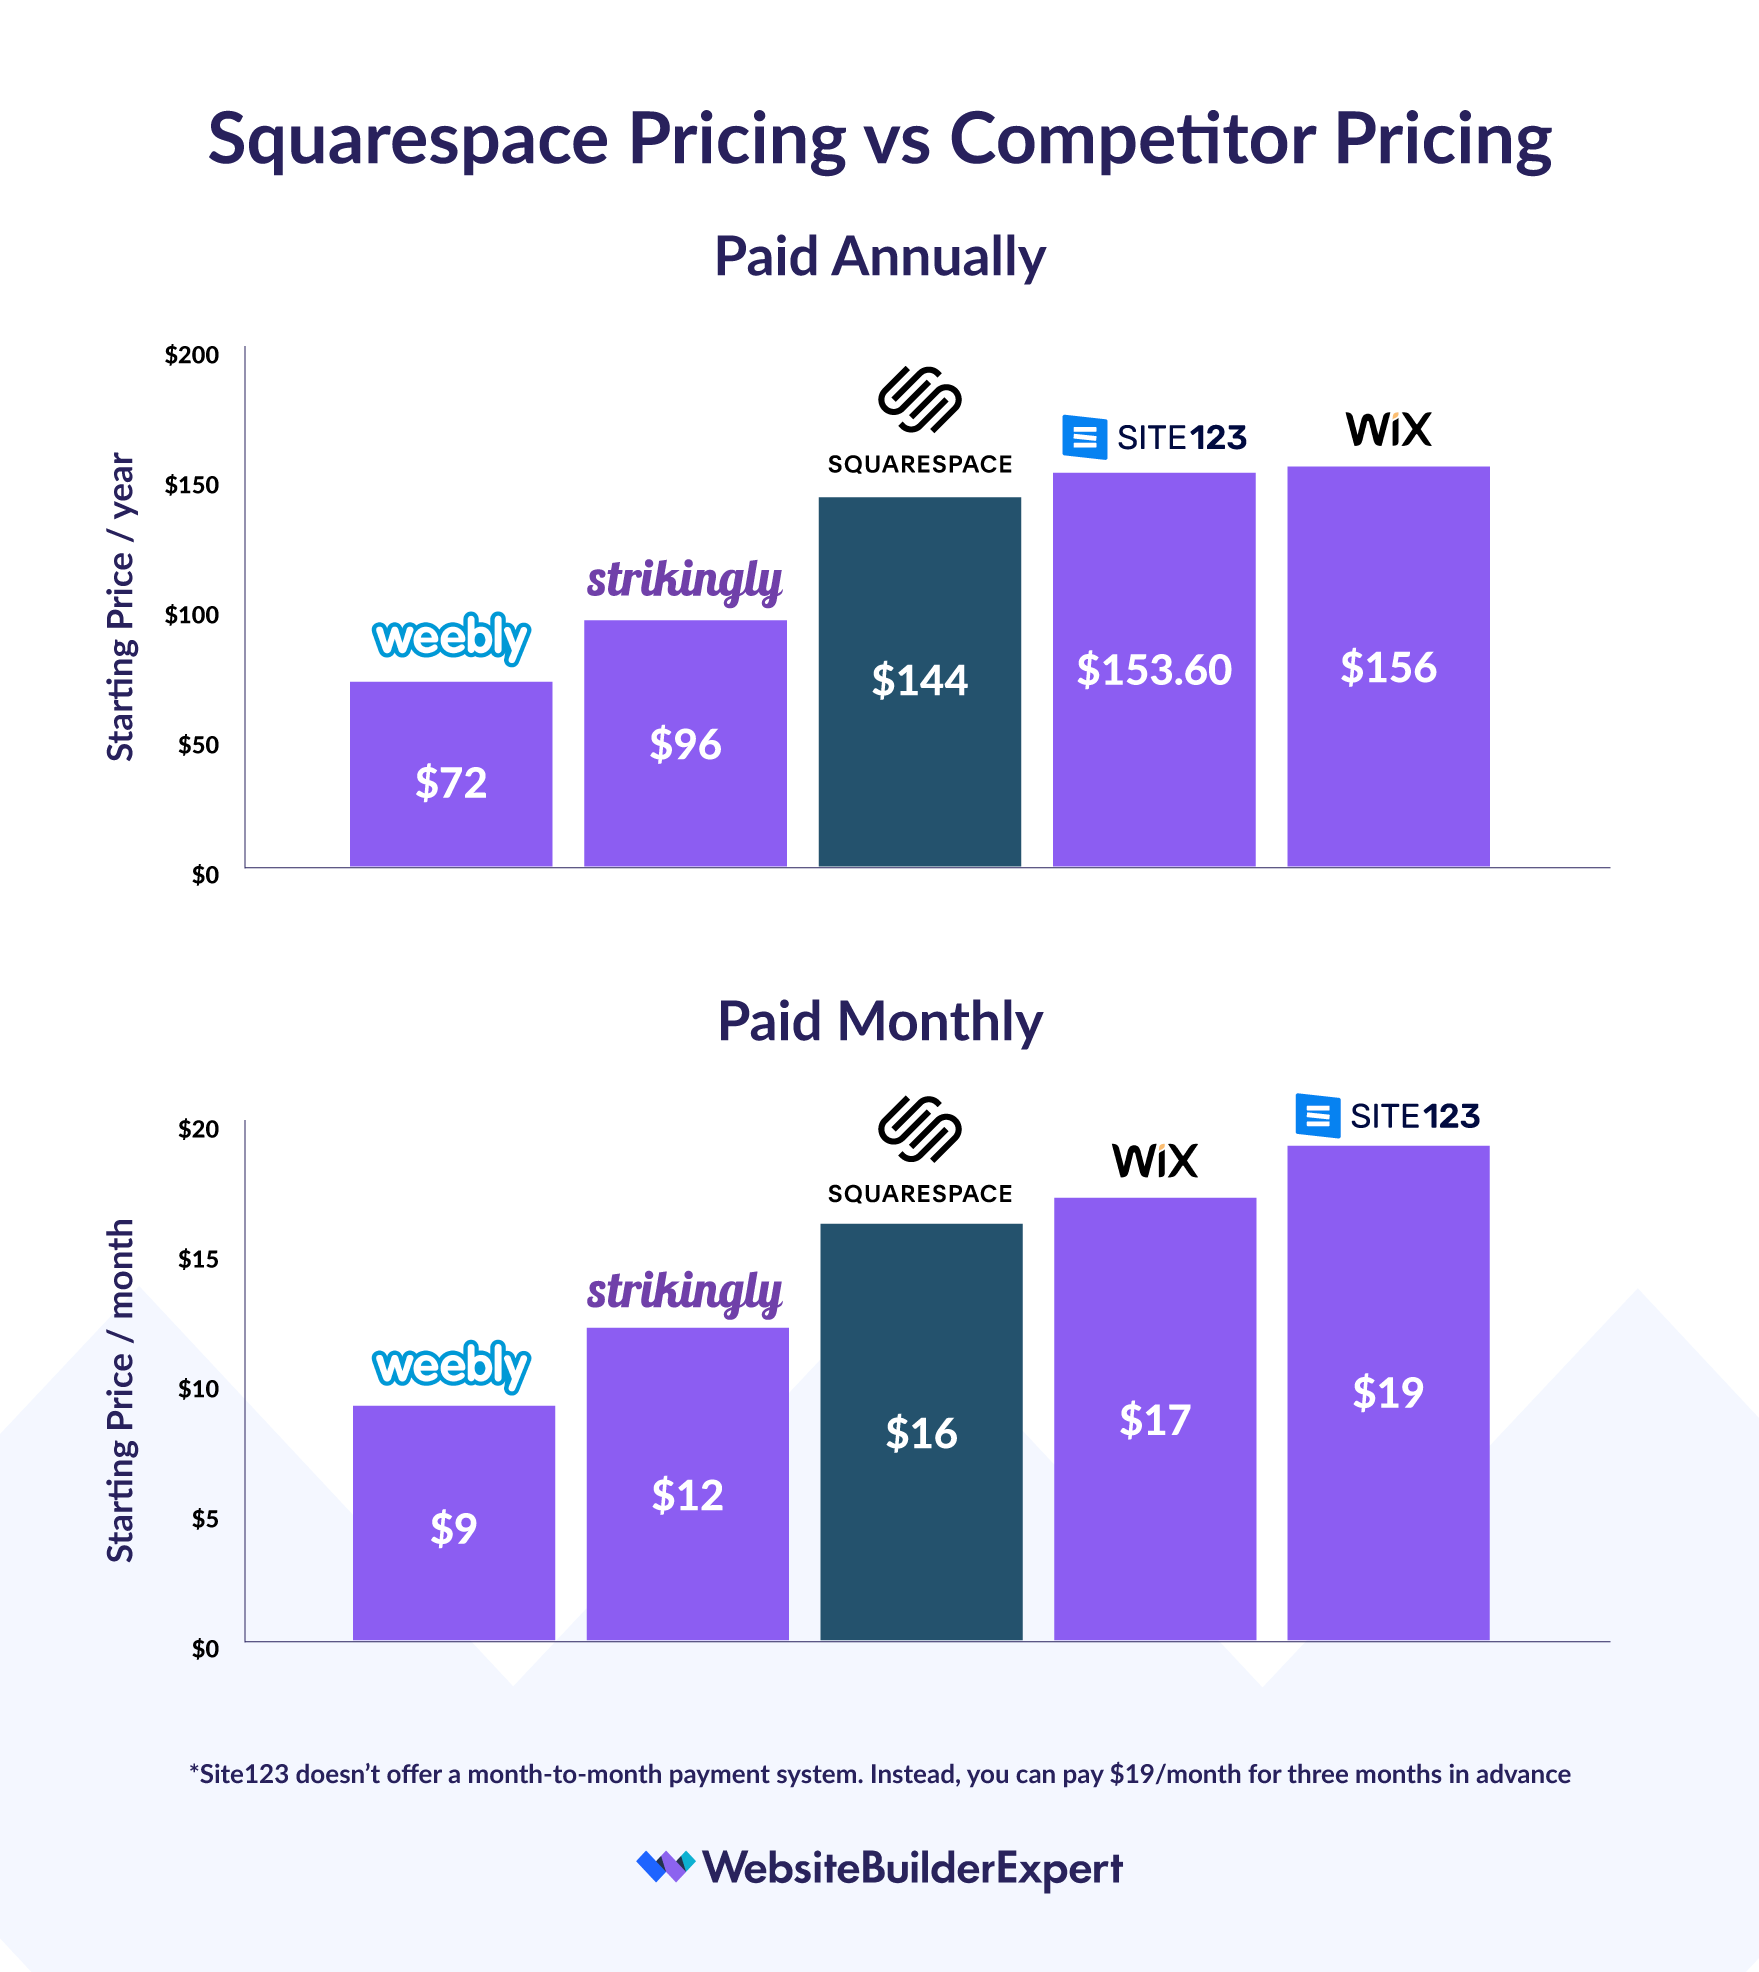 squarespace pricing comparison graph